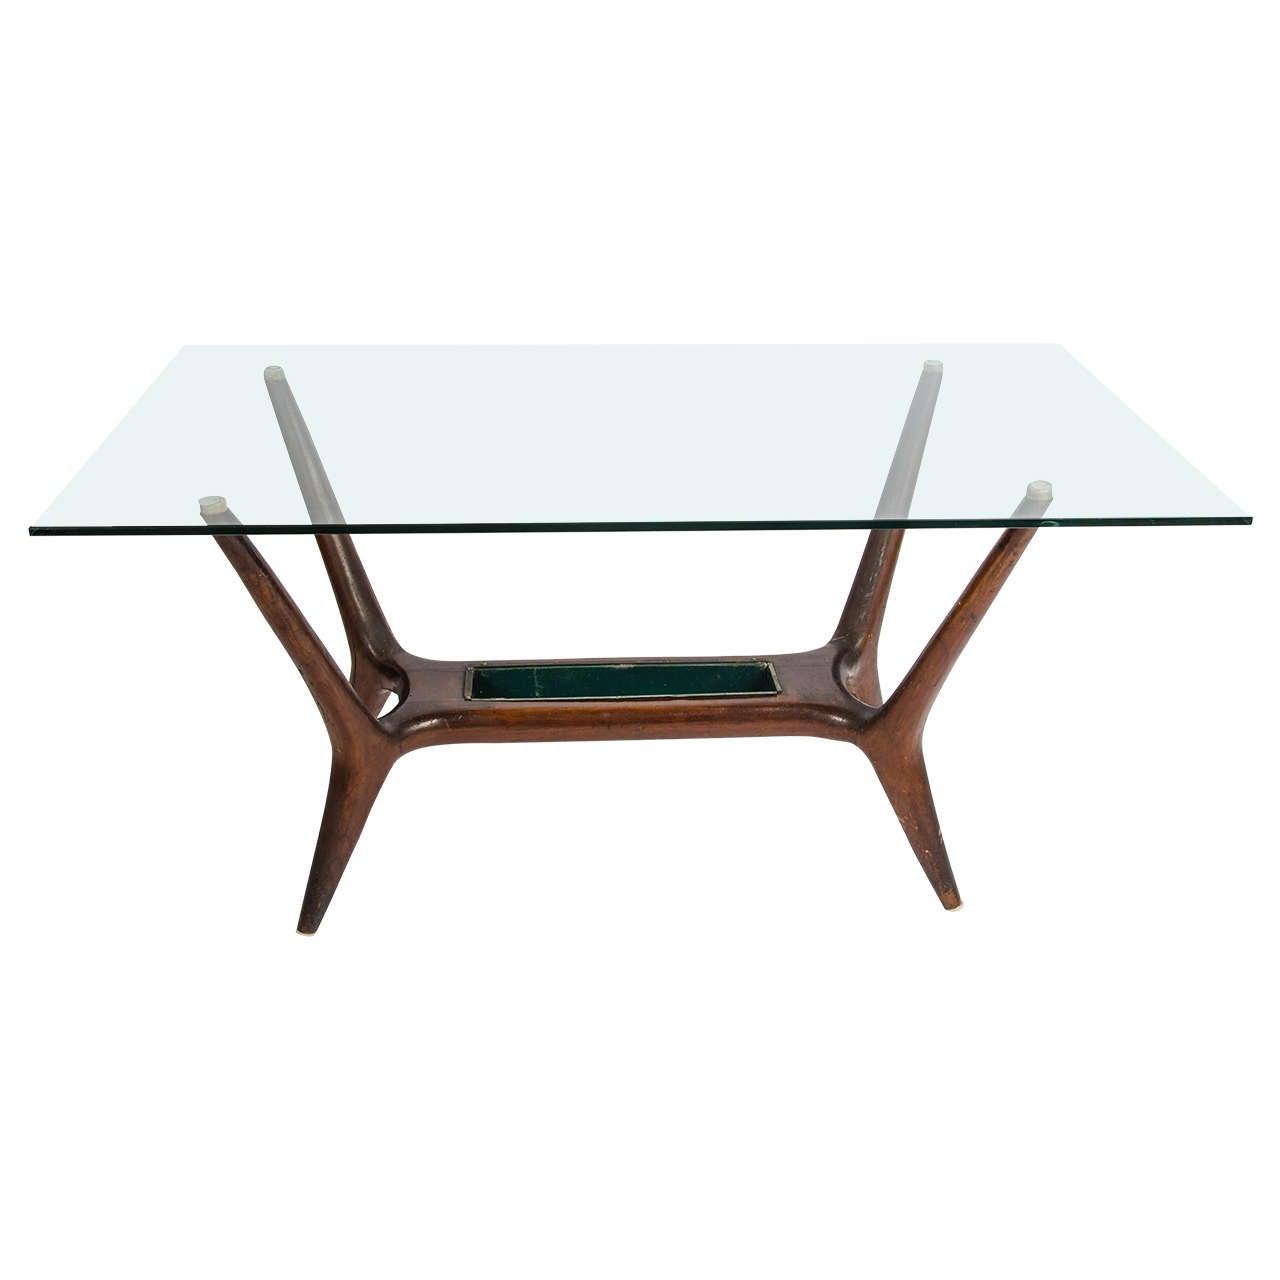 Italian coffee table 1950s at 1stdibs for Italian coffee table